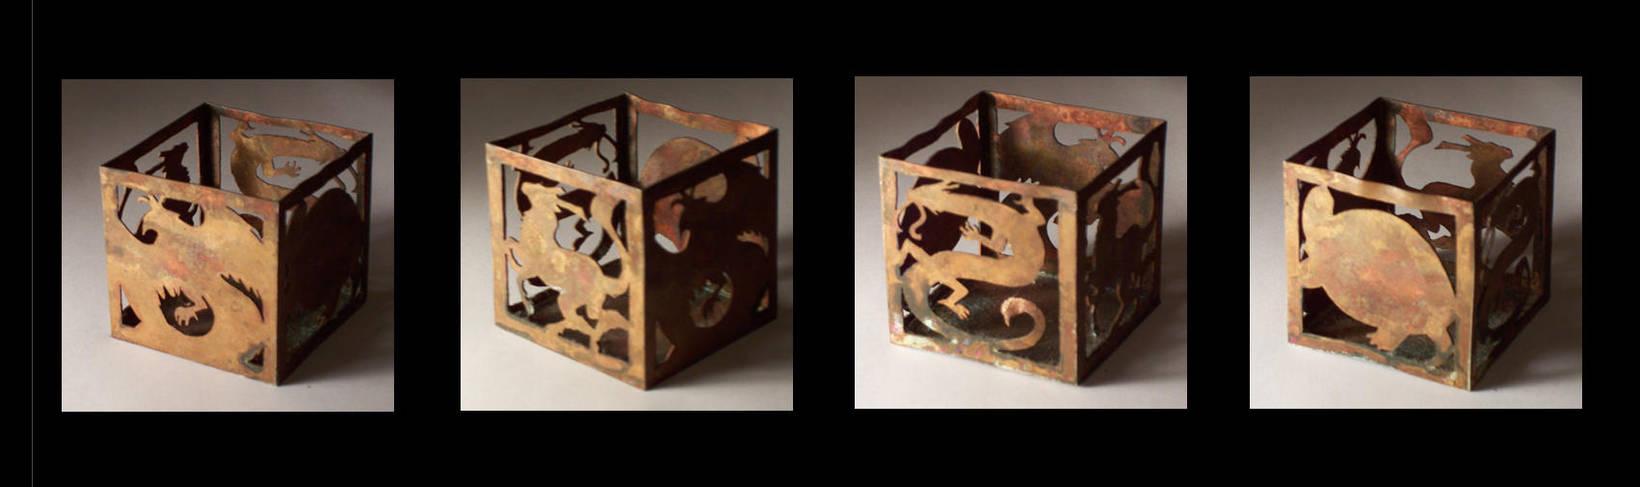 chinese sacred animal box by hibbary